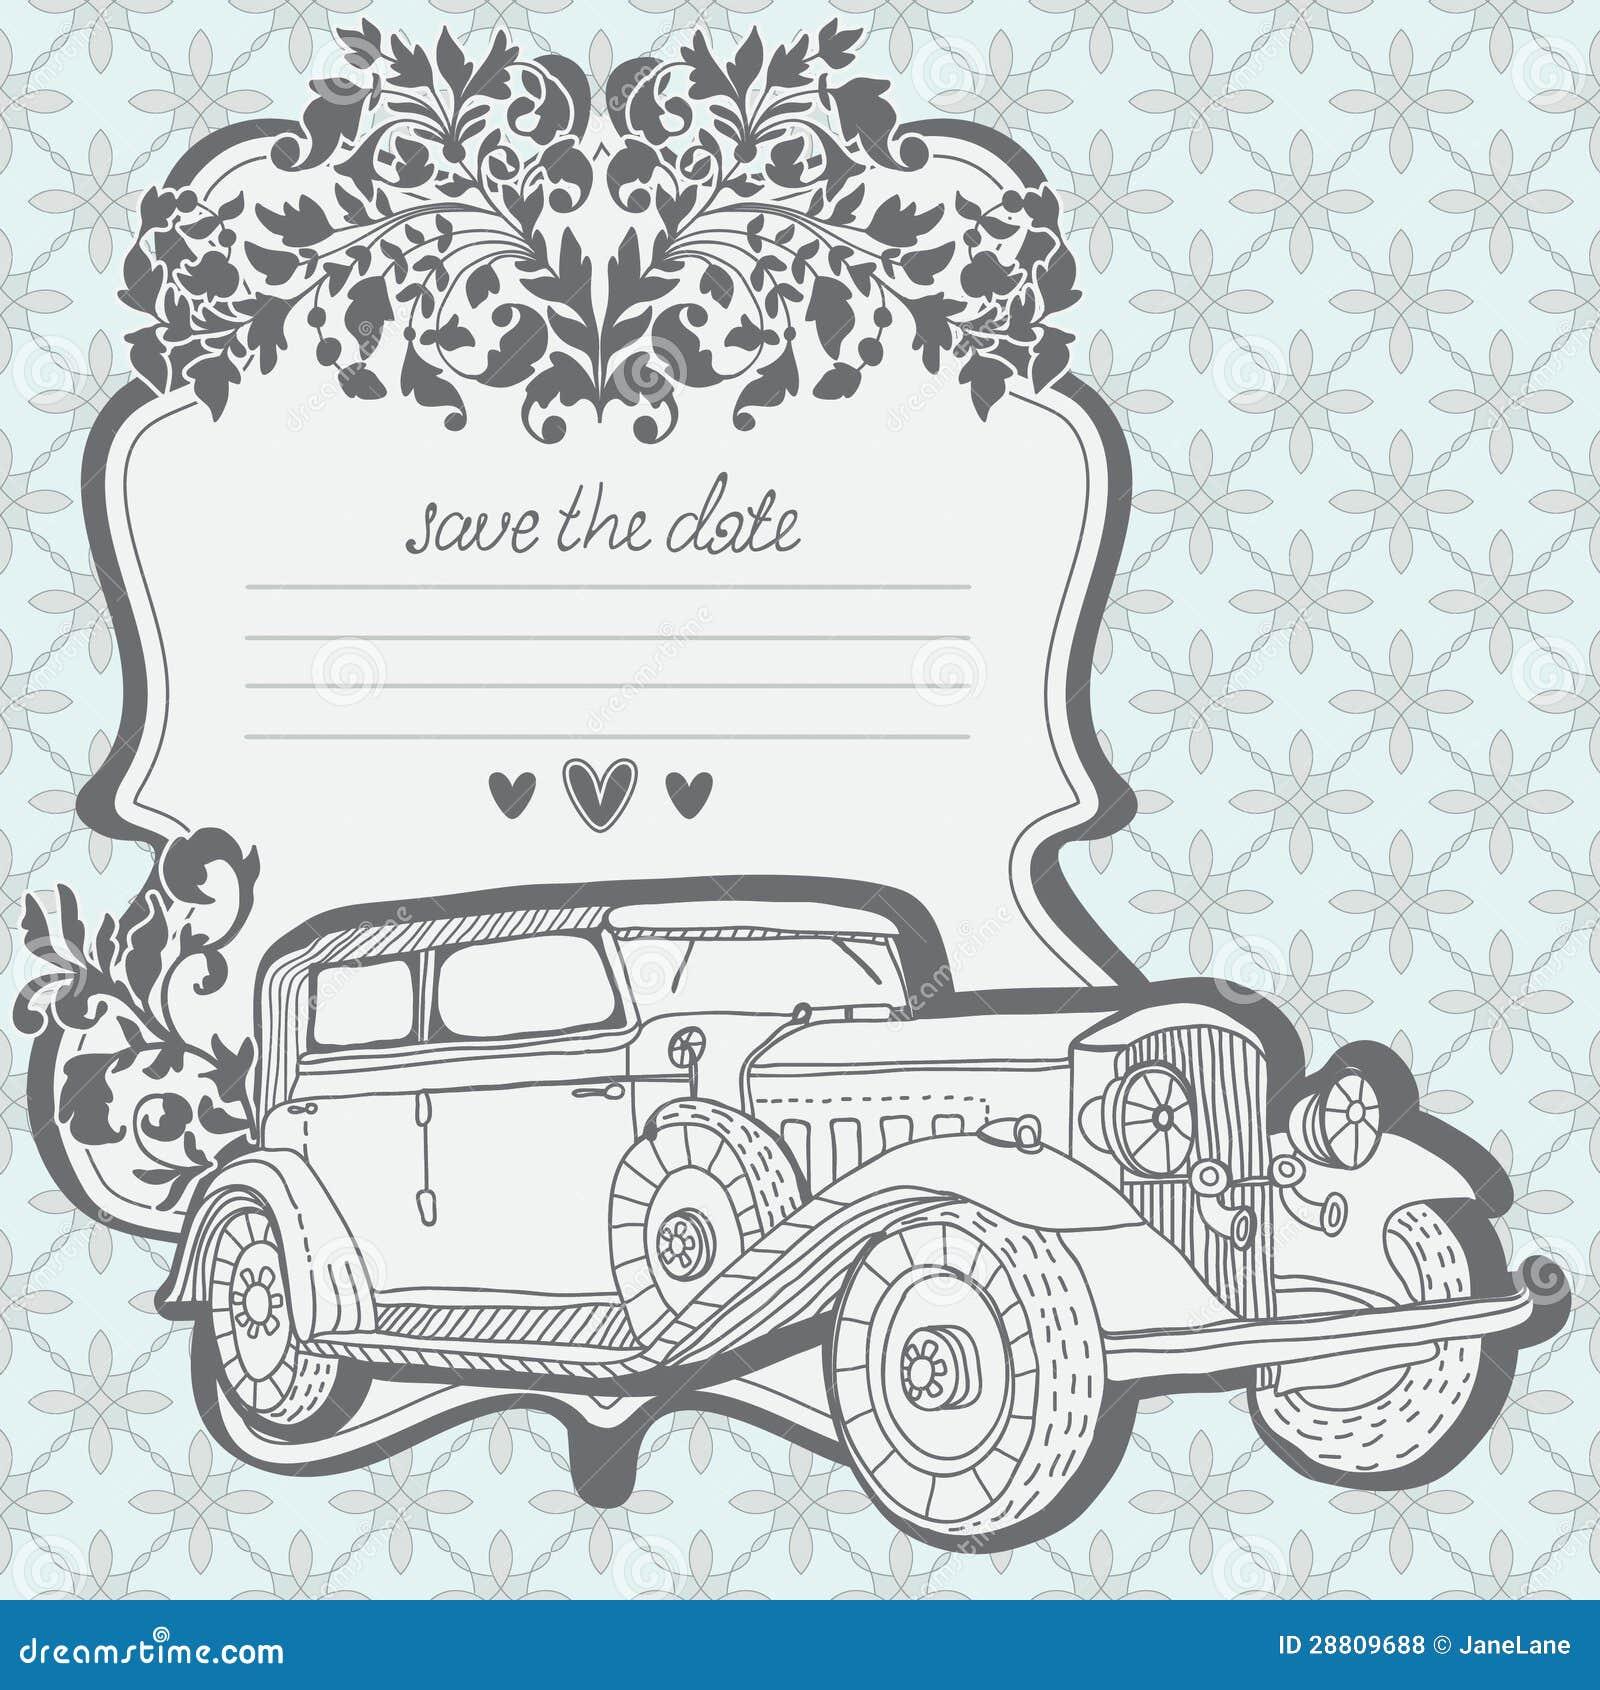 Wedding Invitation Card With Retro Car Stock Vector Image 28809688